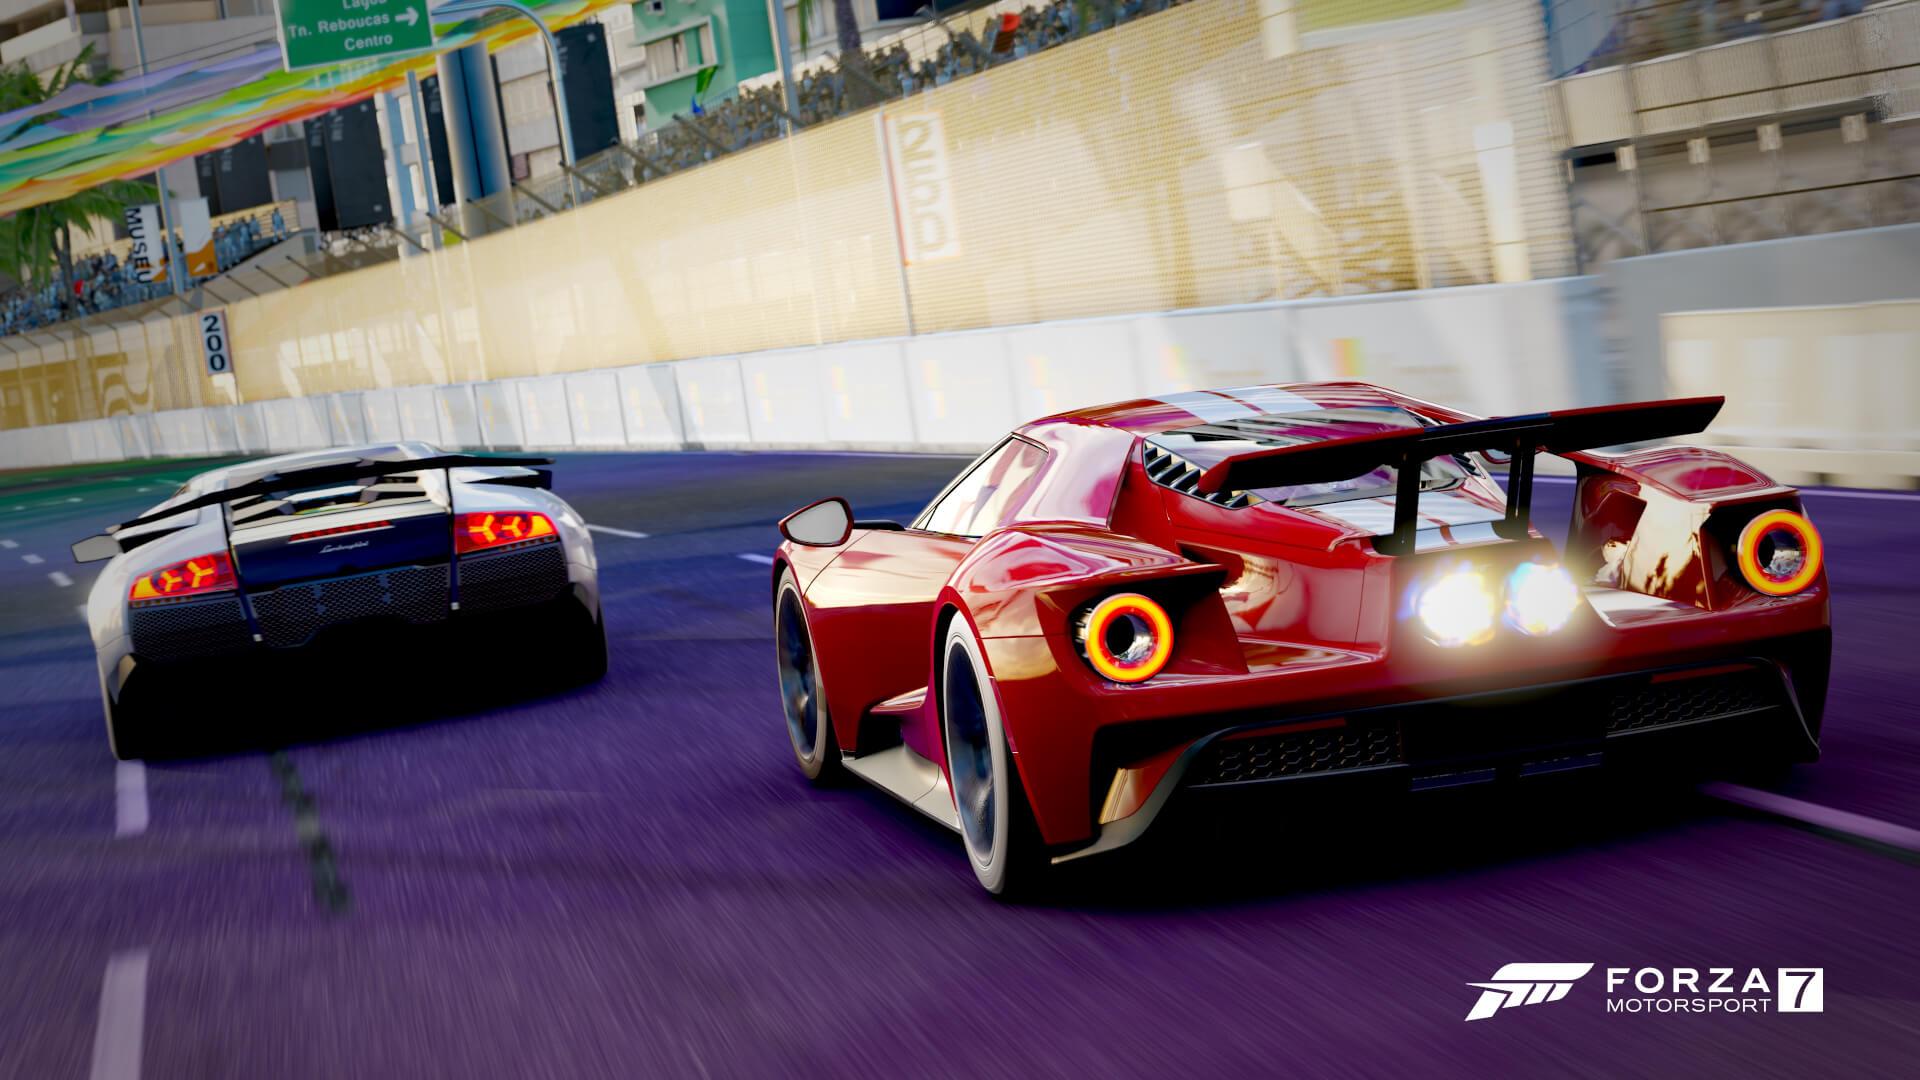 Forza Motorsport 7 Celebrates April Fools Day With Unique Special